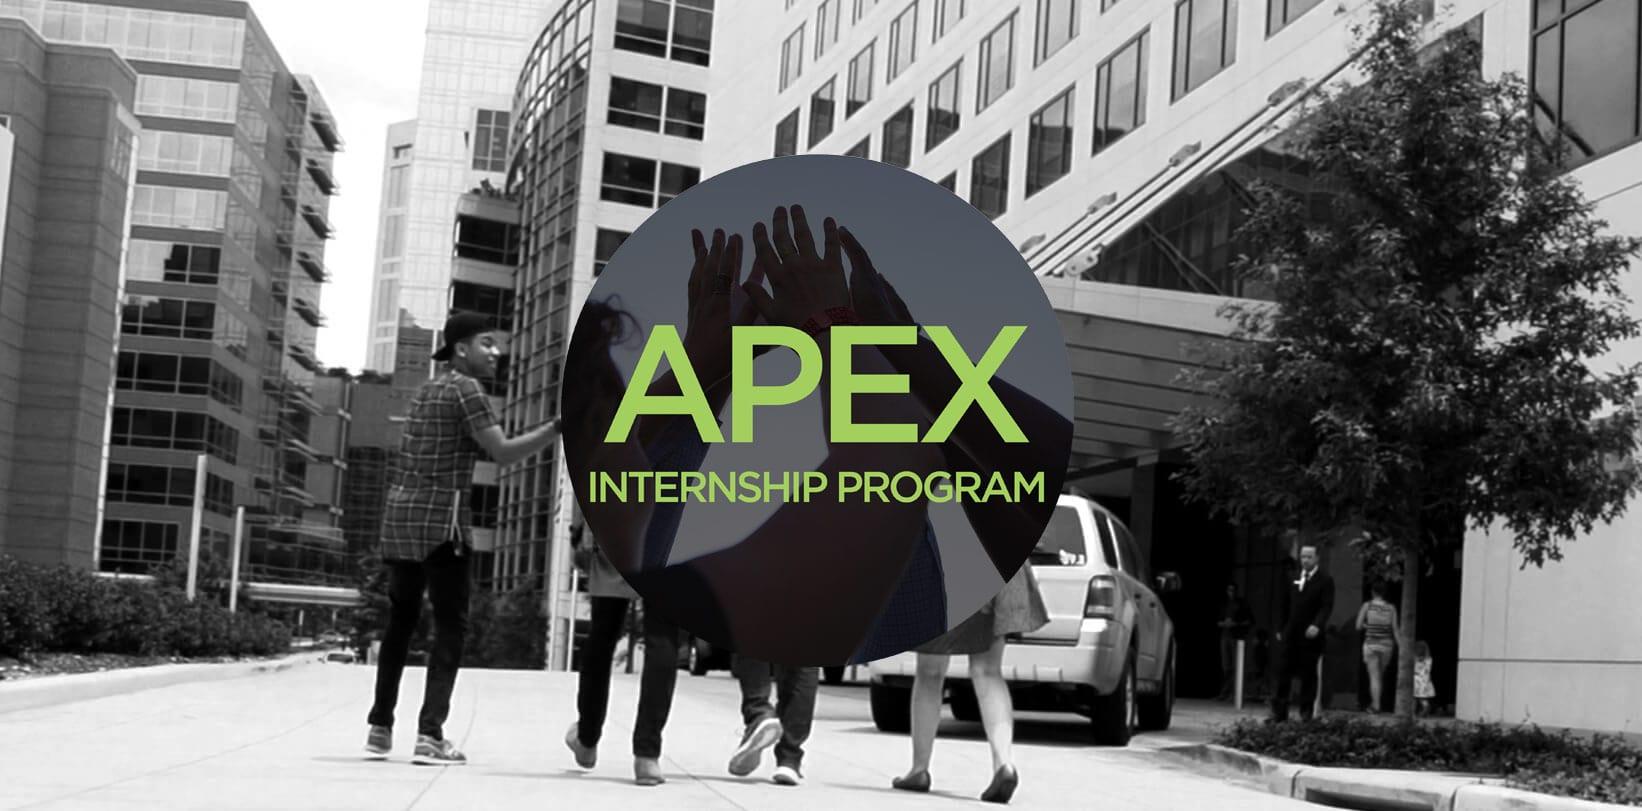 APEX Internship Program